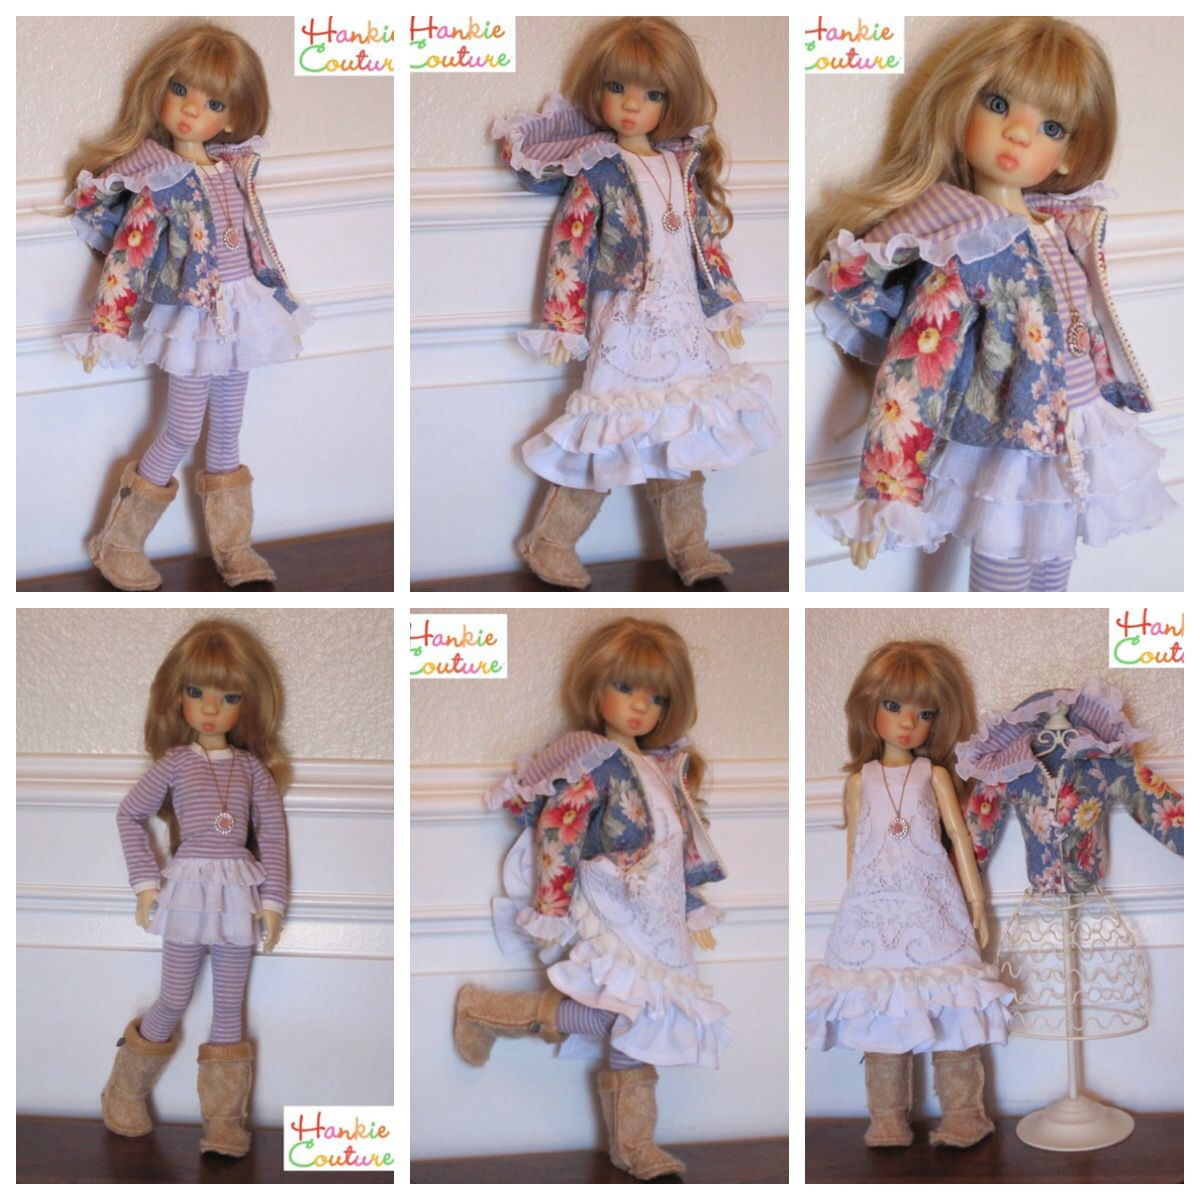 OOAK Handmade MSD BJD Outfit for Kaye Wiggs